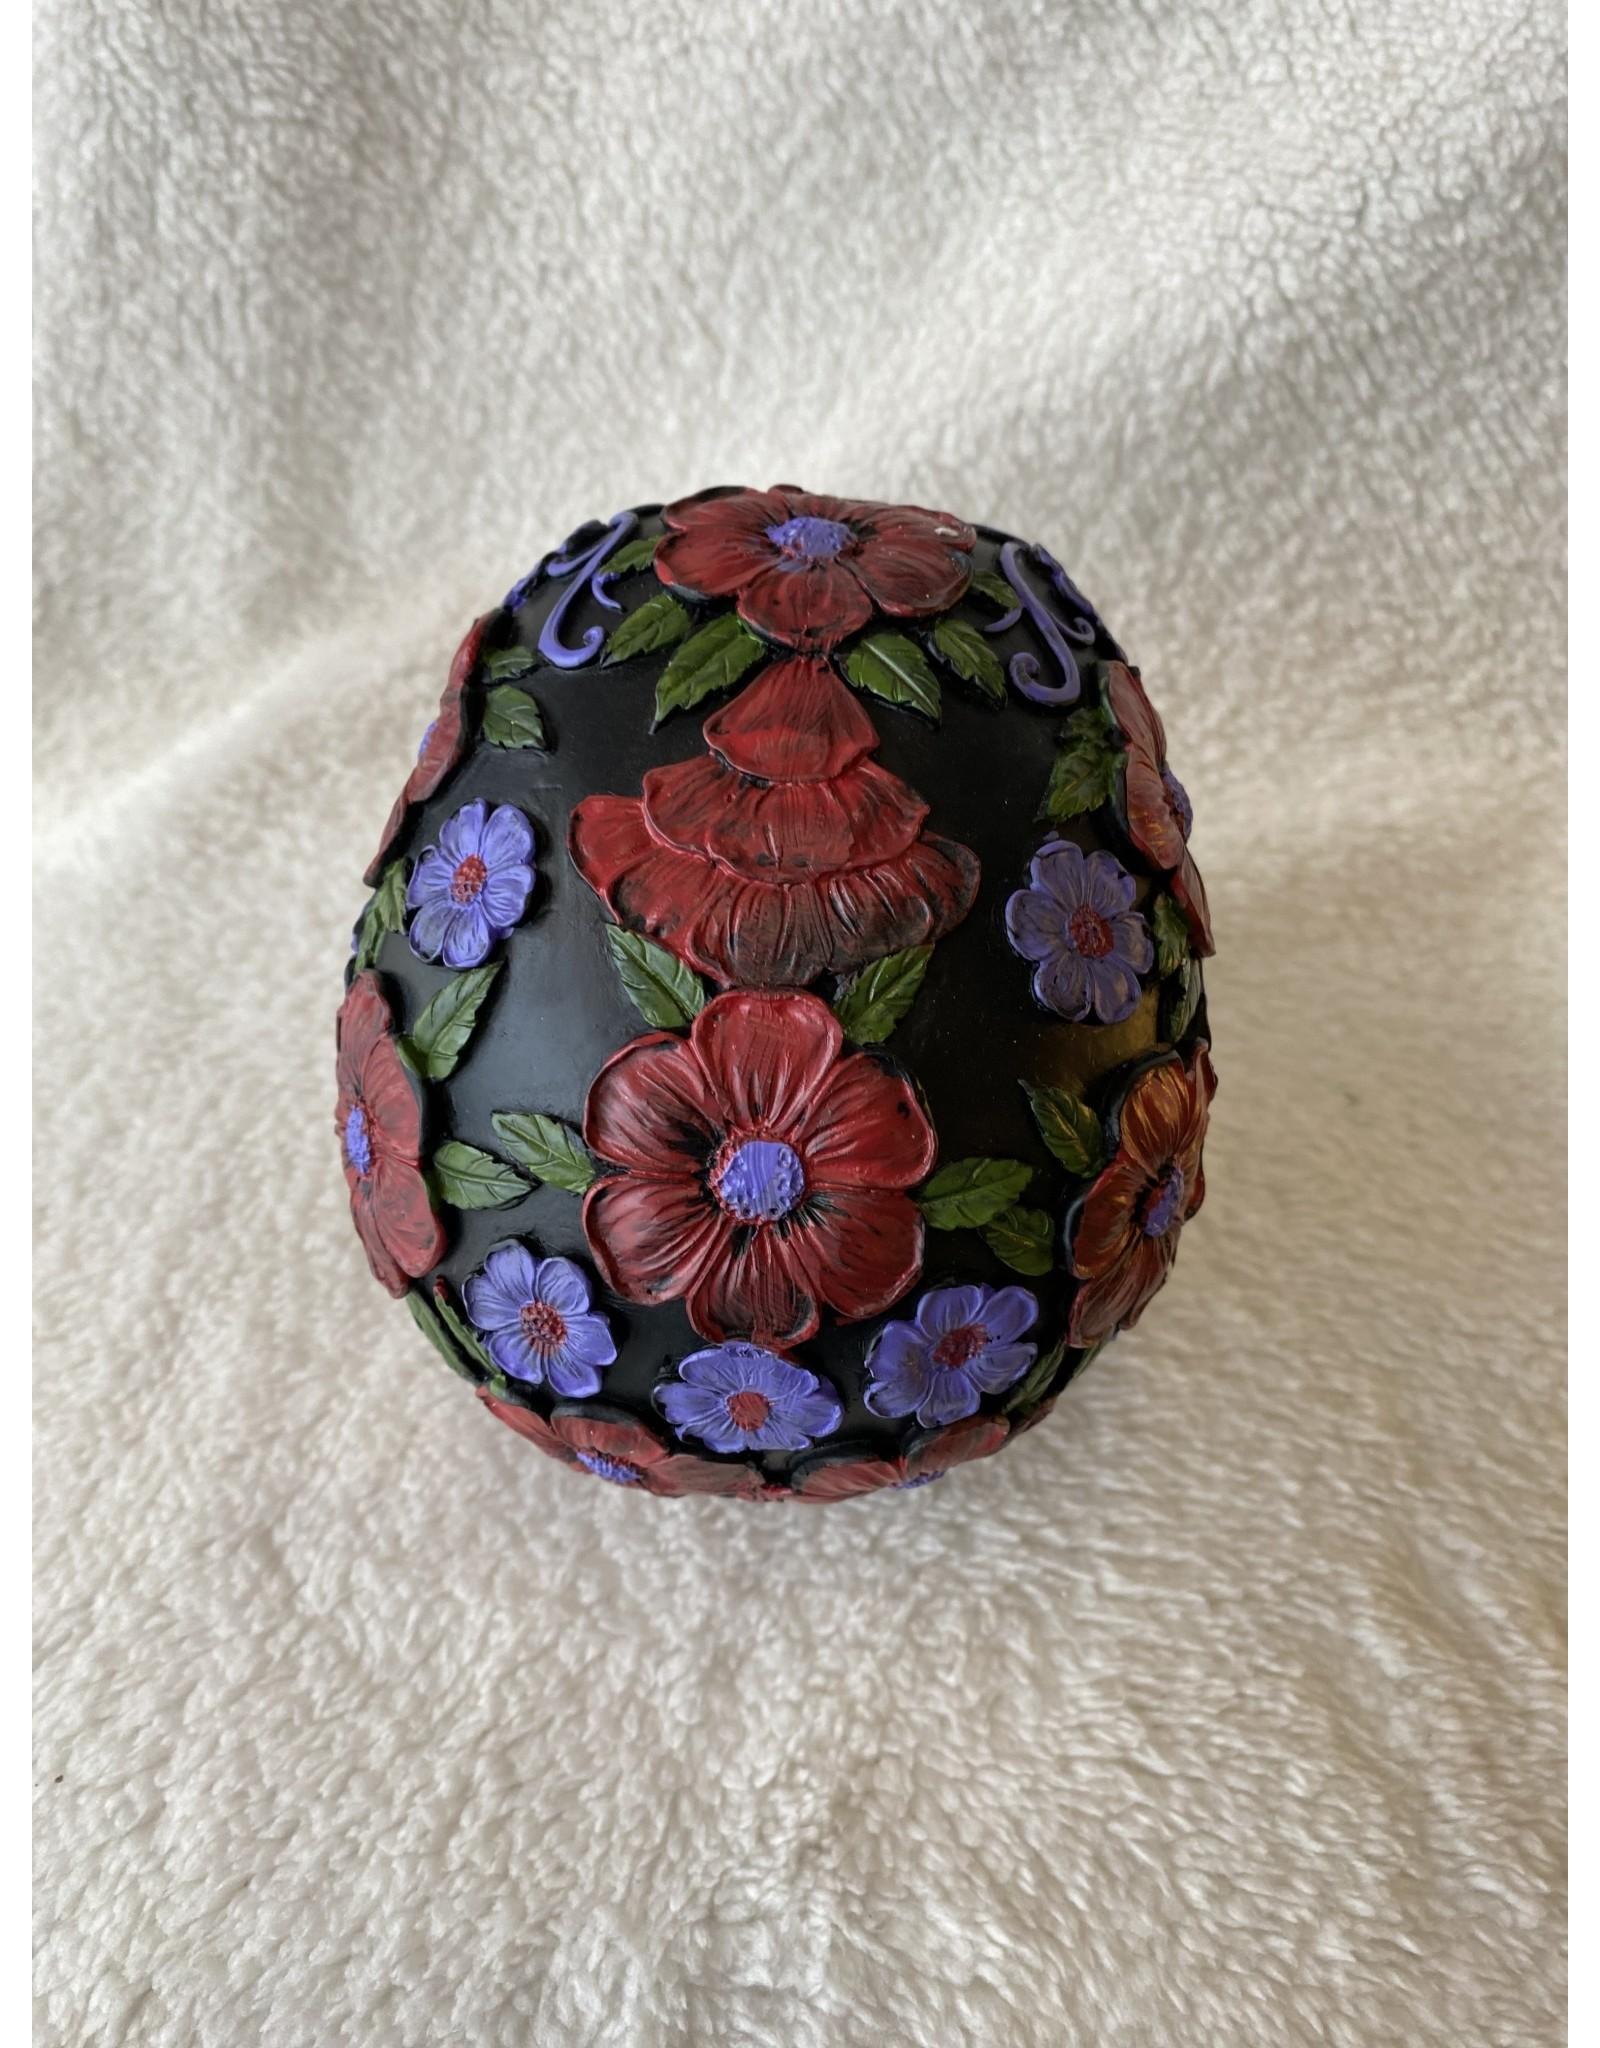 Floral Skull | Black w/ Red & Purple Flowers